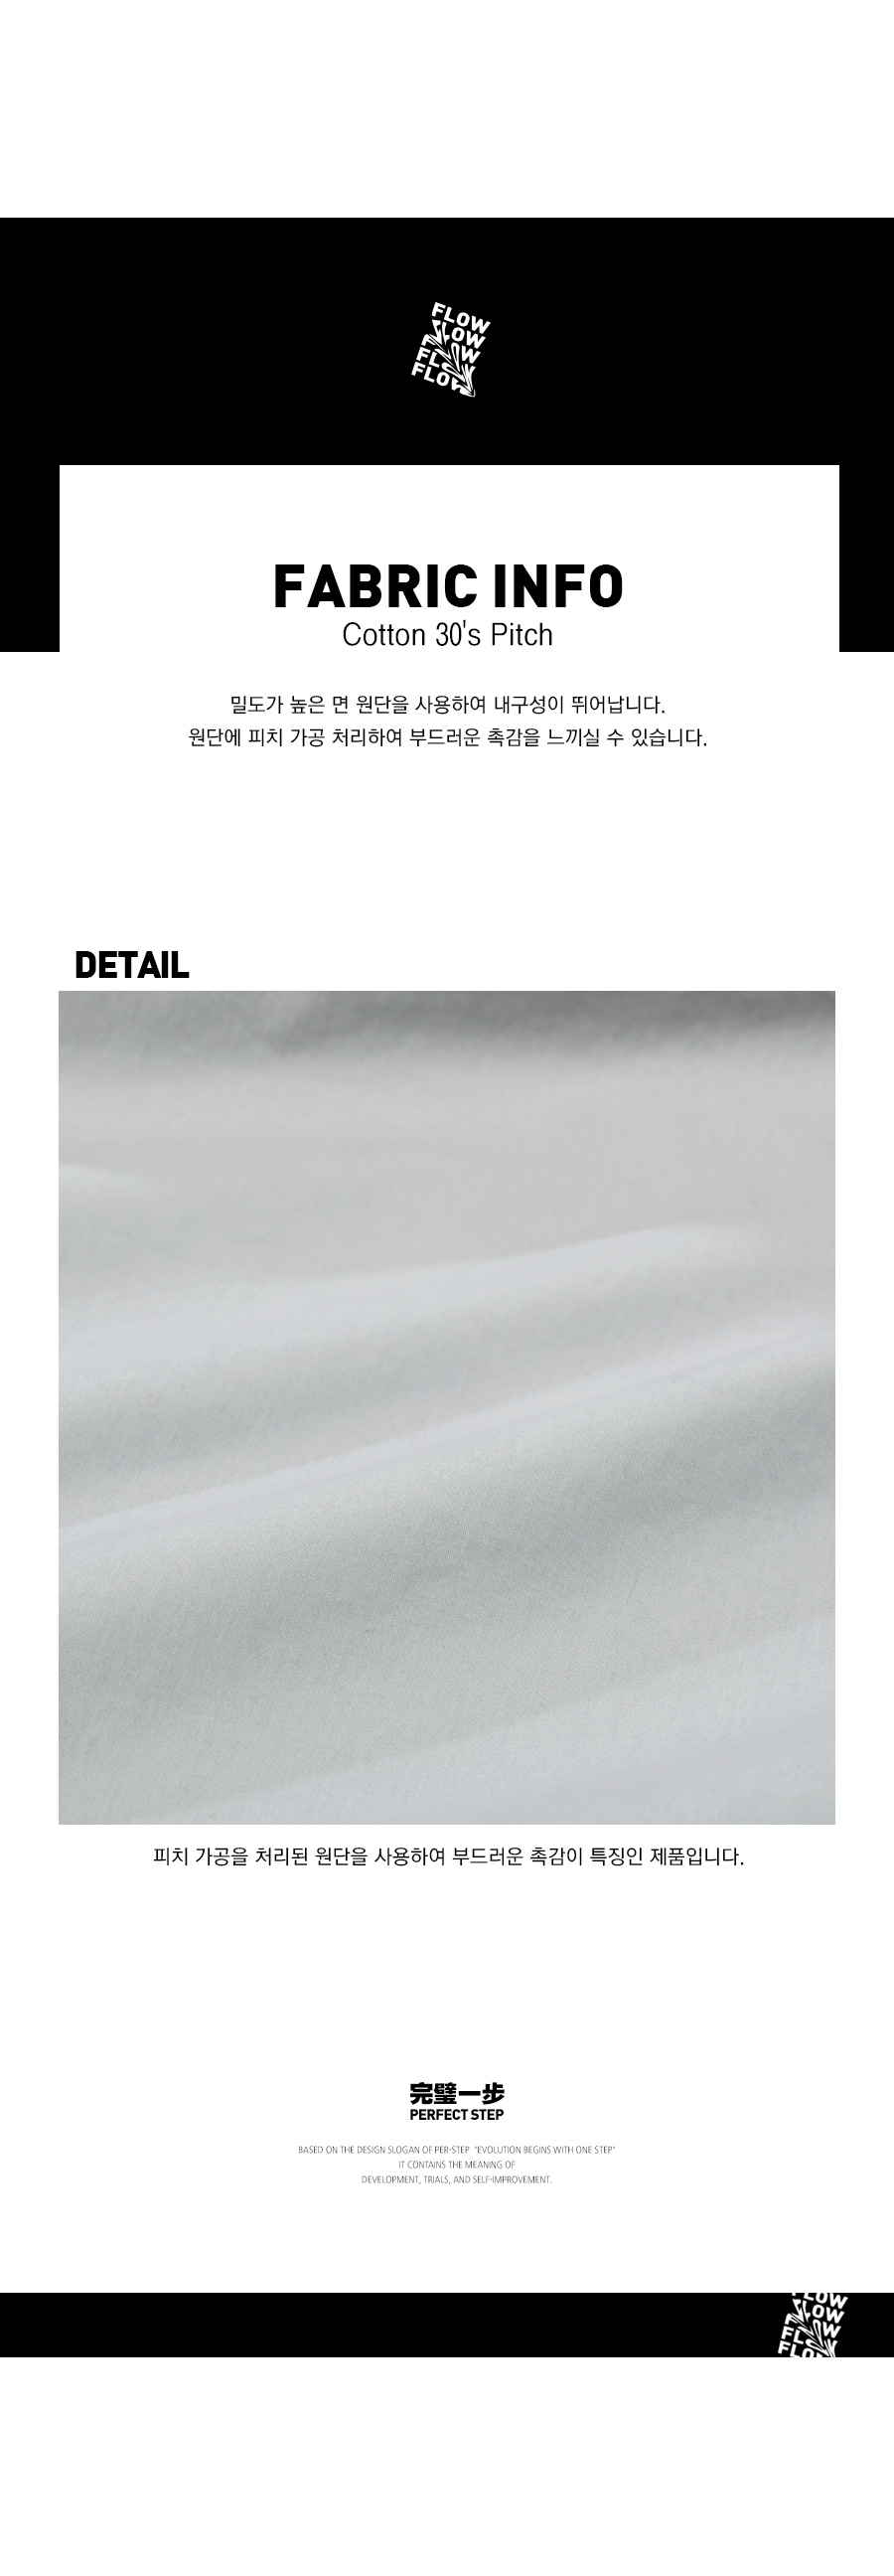 4276_detail_uk.jpg